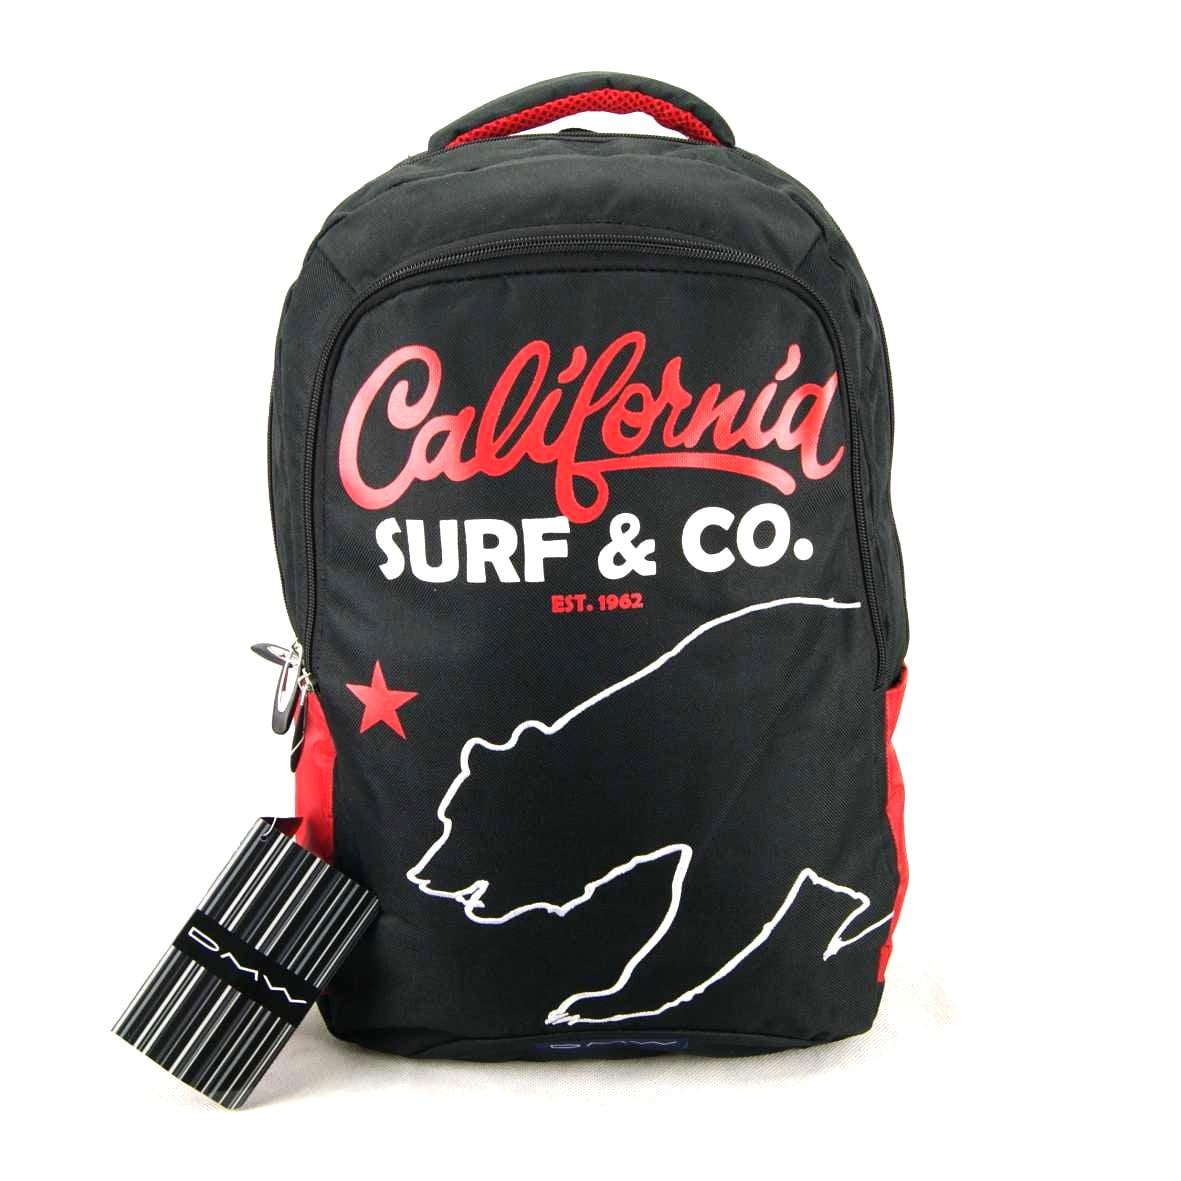 Mochila California Surf e Co. Preta DMW 11034